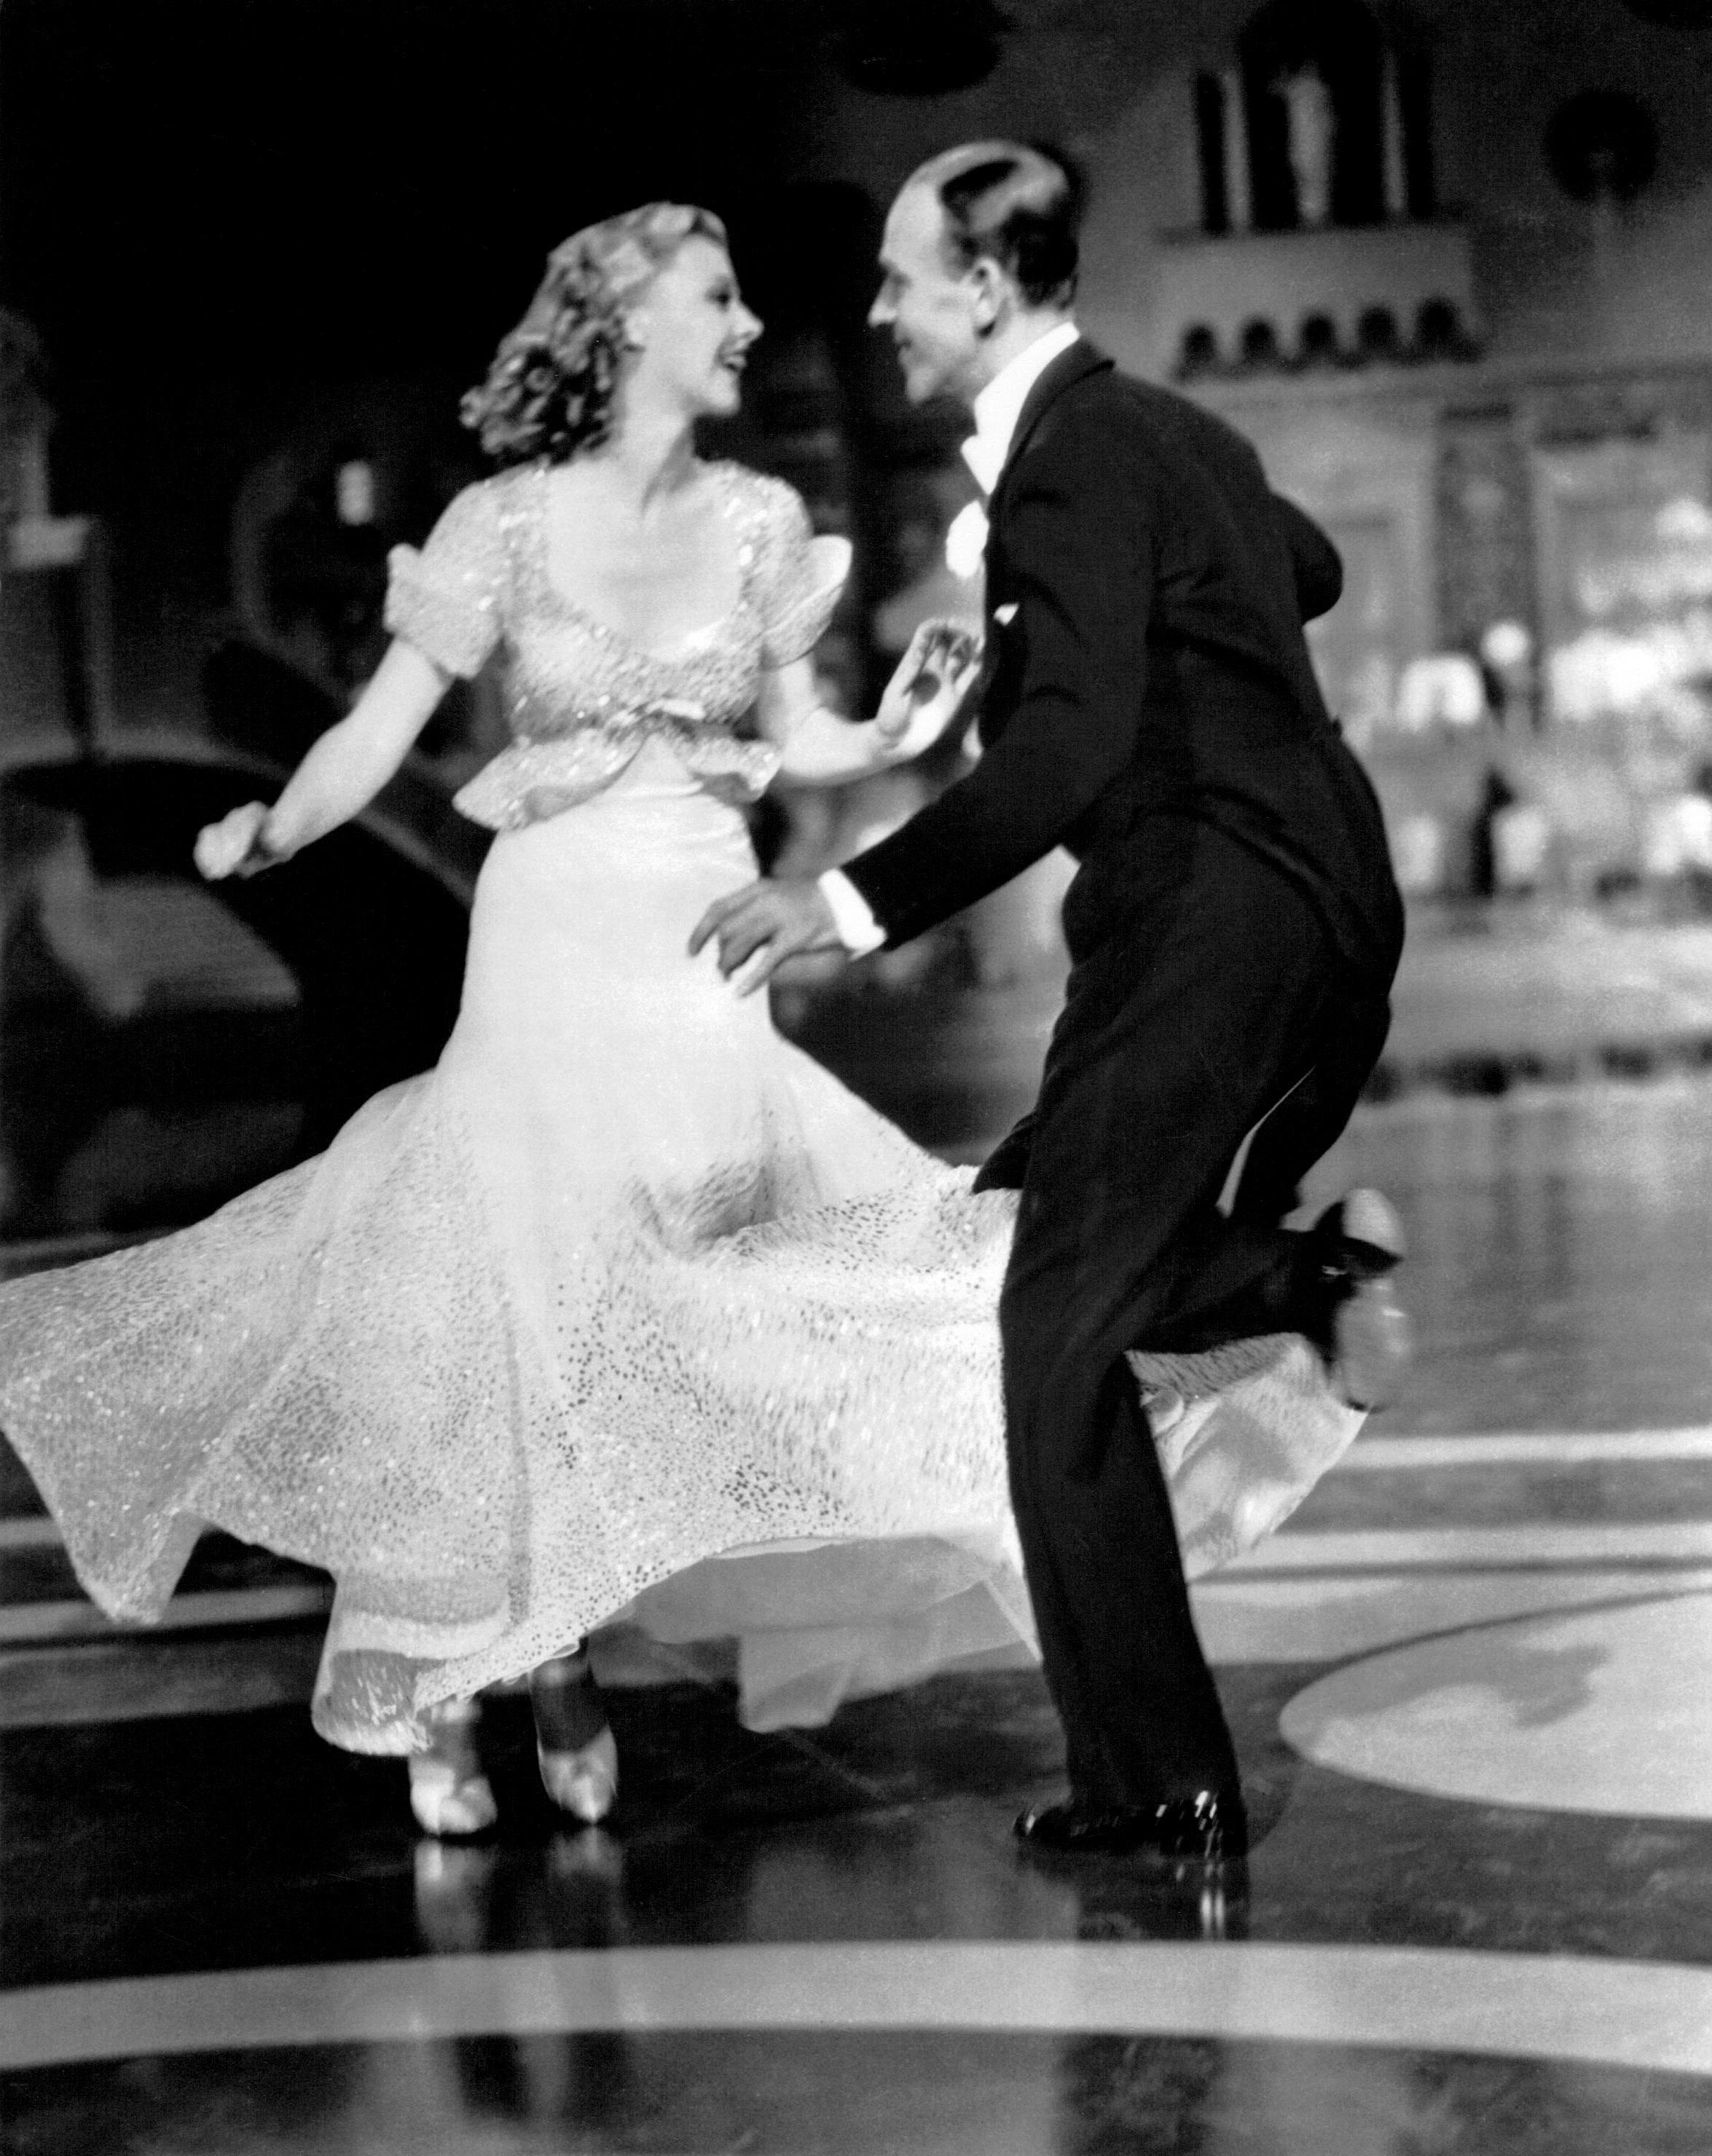 Fred & Ginger: Forever Dancing